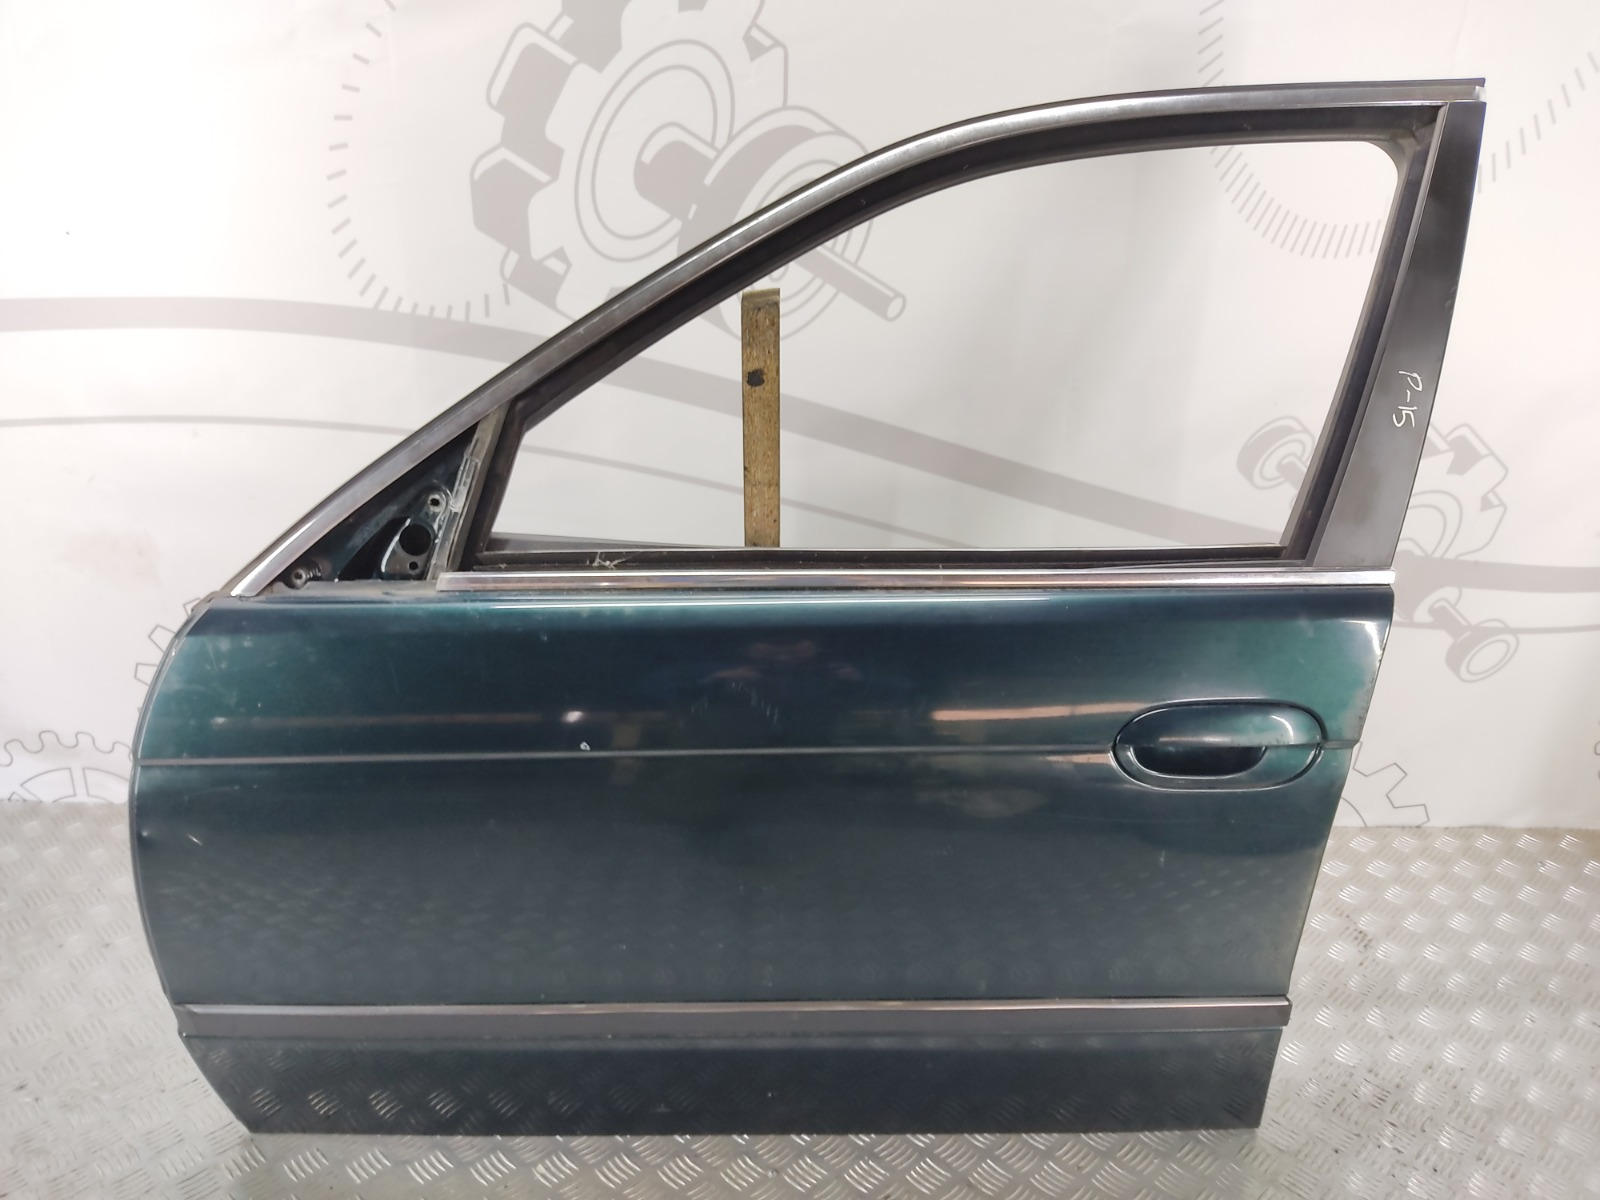 Дверь передняя левая Bmw 5 E39 2.5 TDS 1997 (б/у)